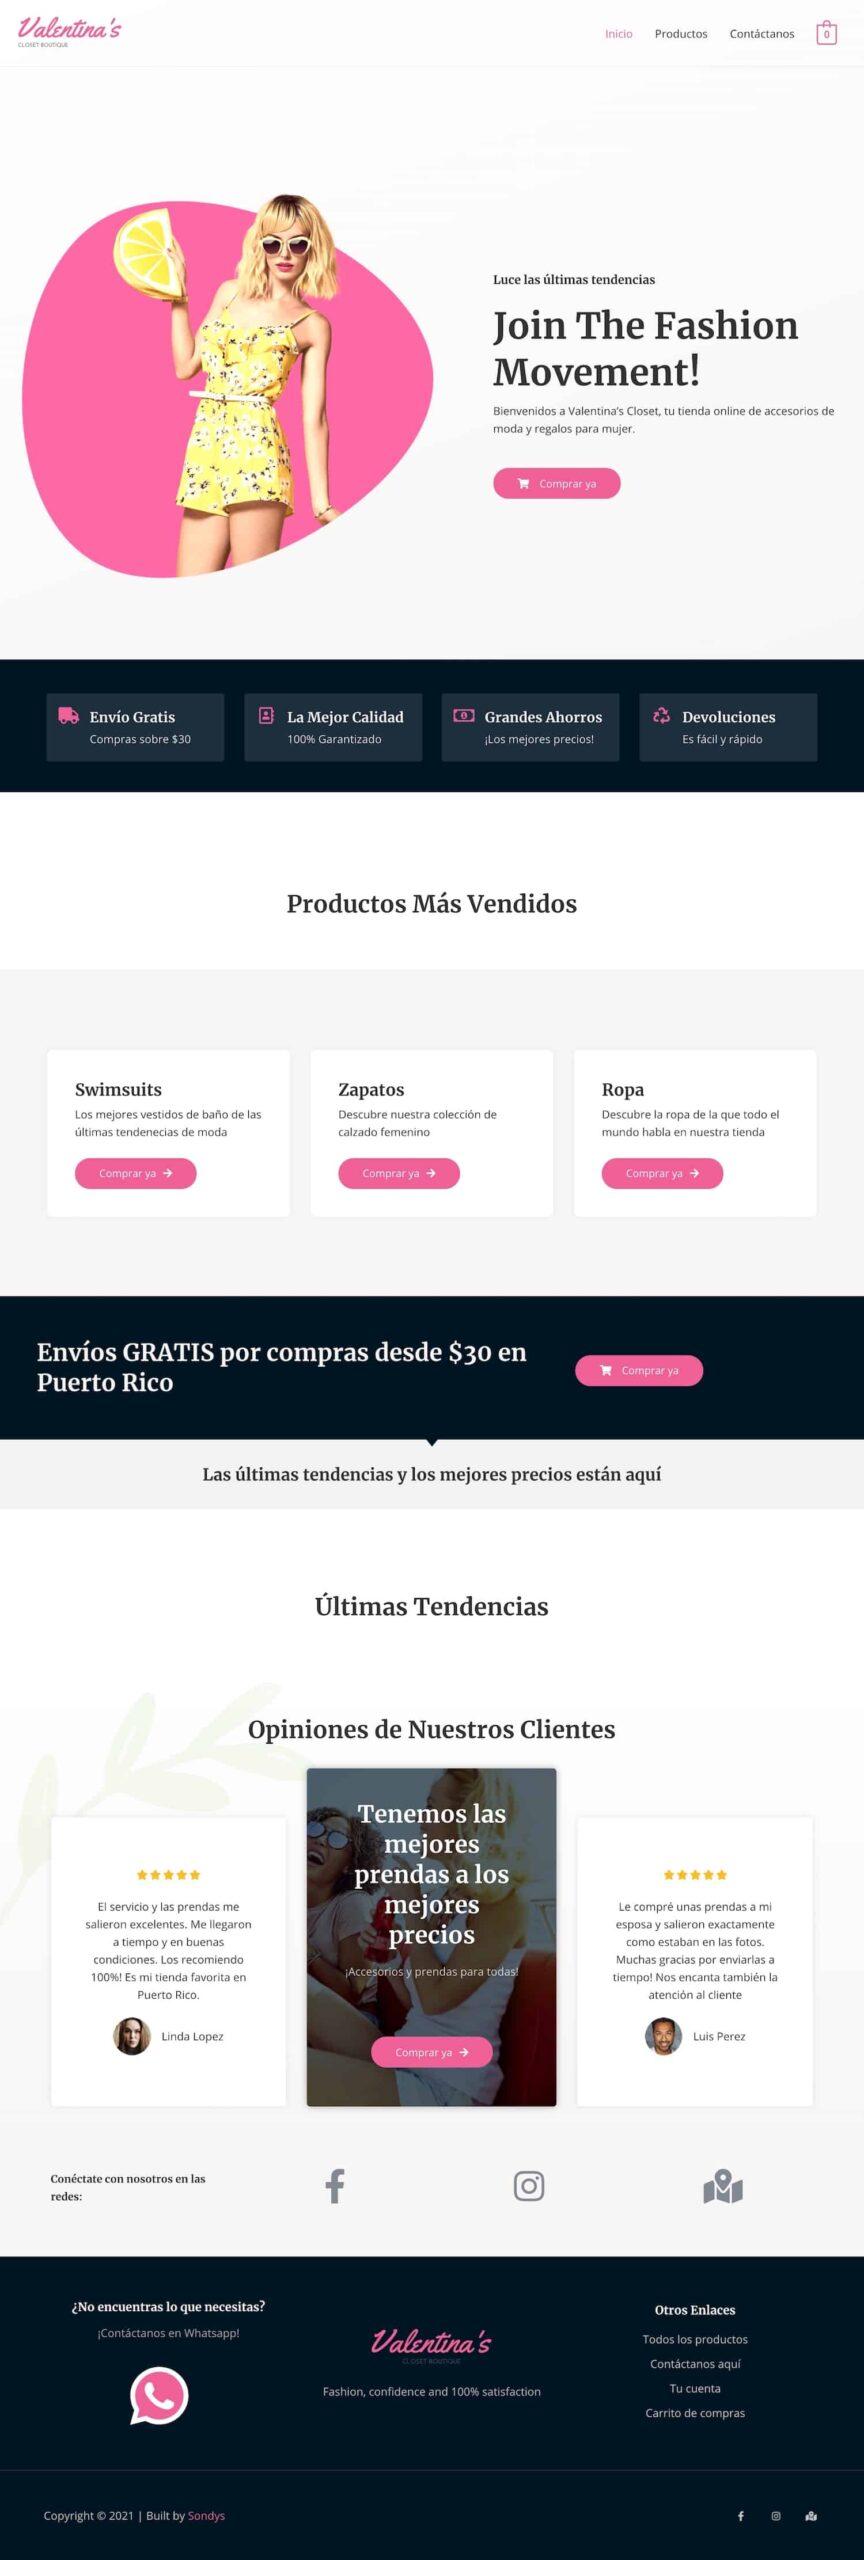 sondys online marketing web design web development houston valentinascloset.com